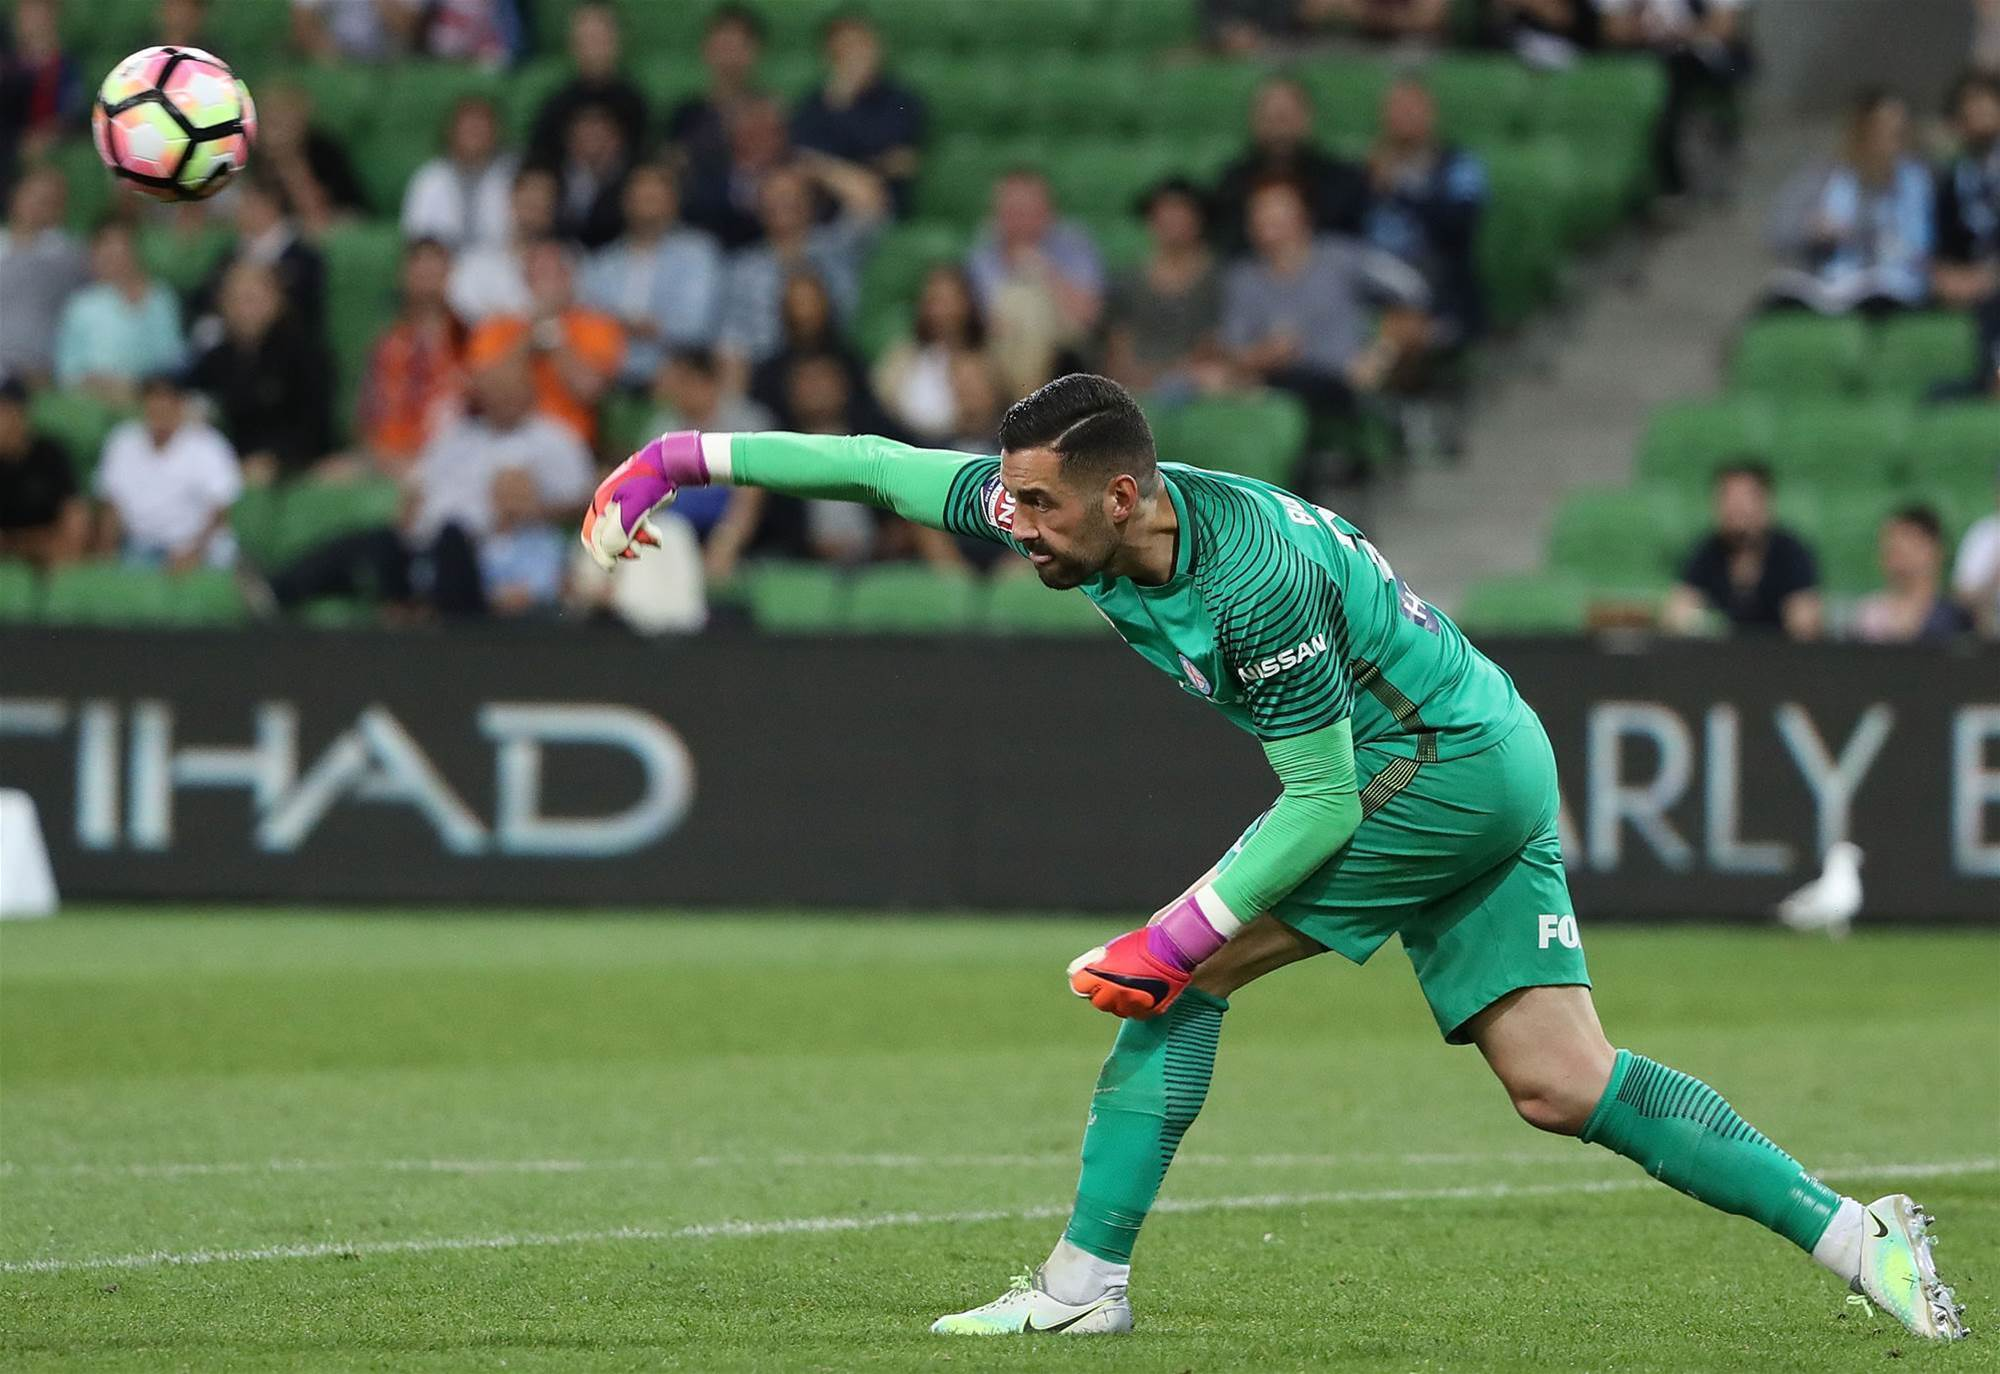 City re-sign goalkeeper